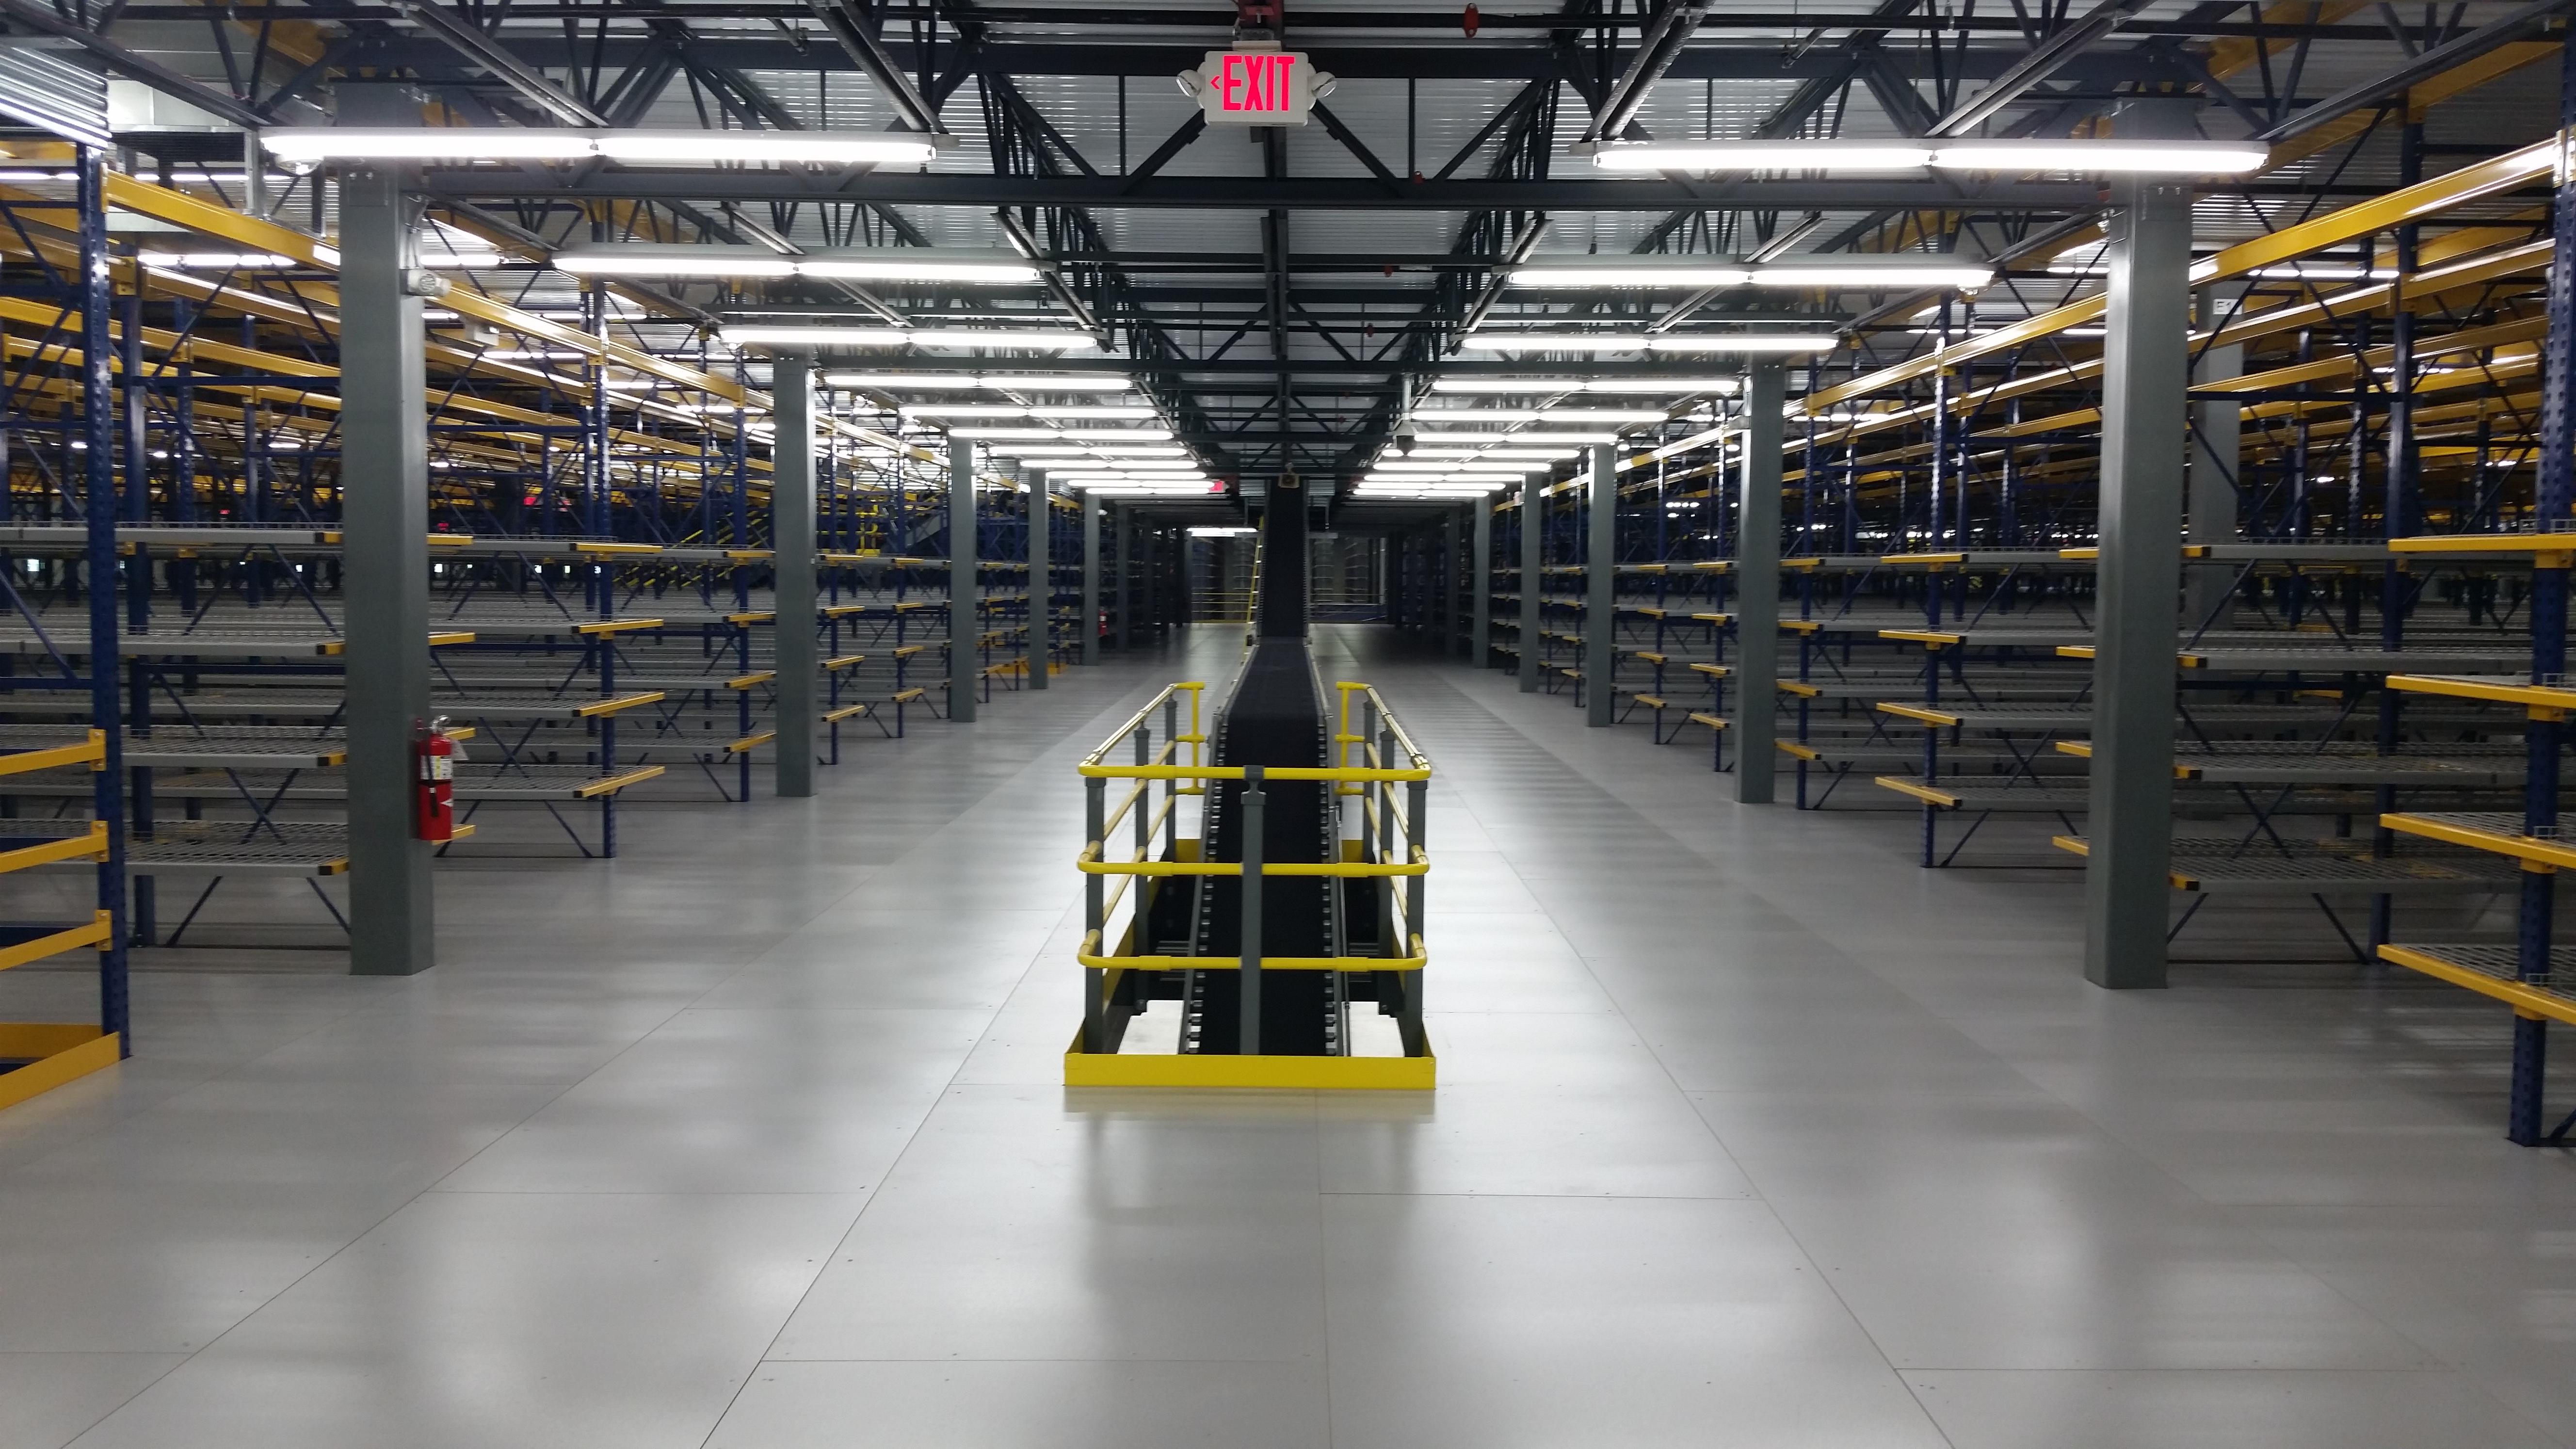 https://i1.wp.com/www.warehousedesign.net/wp-content/uploads/2nd-Level-Mezzanine.jpg